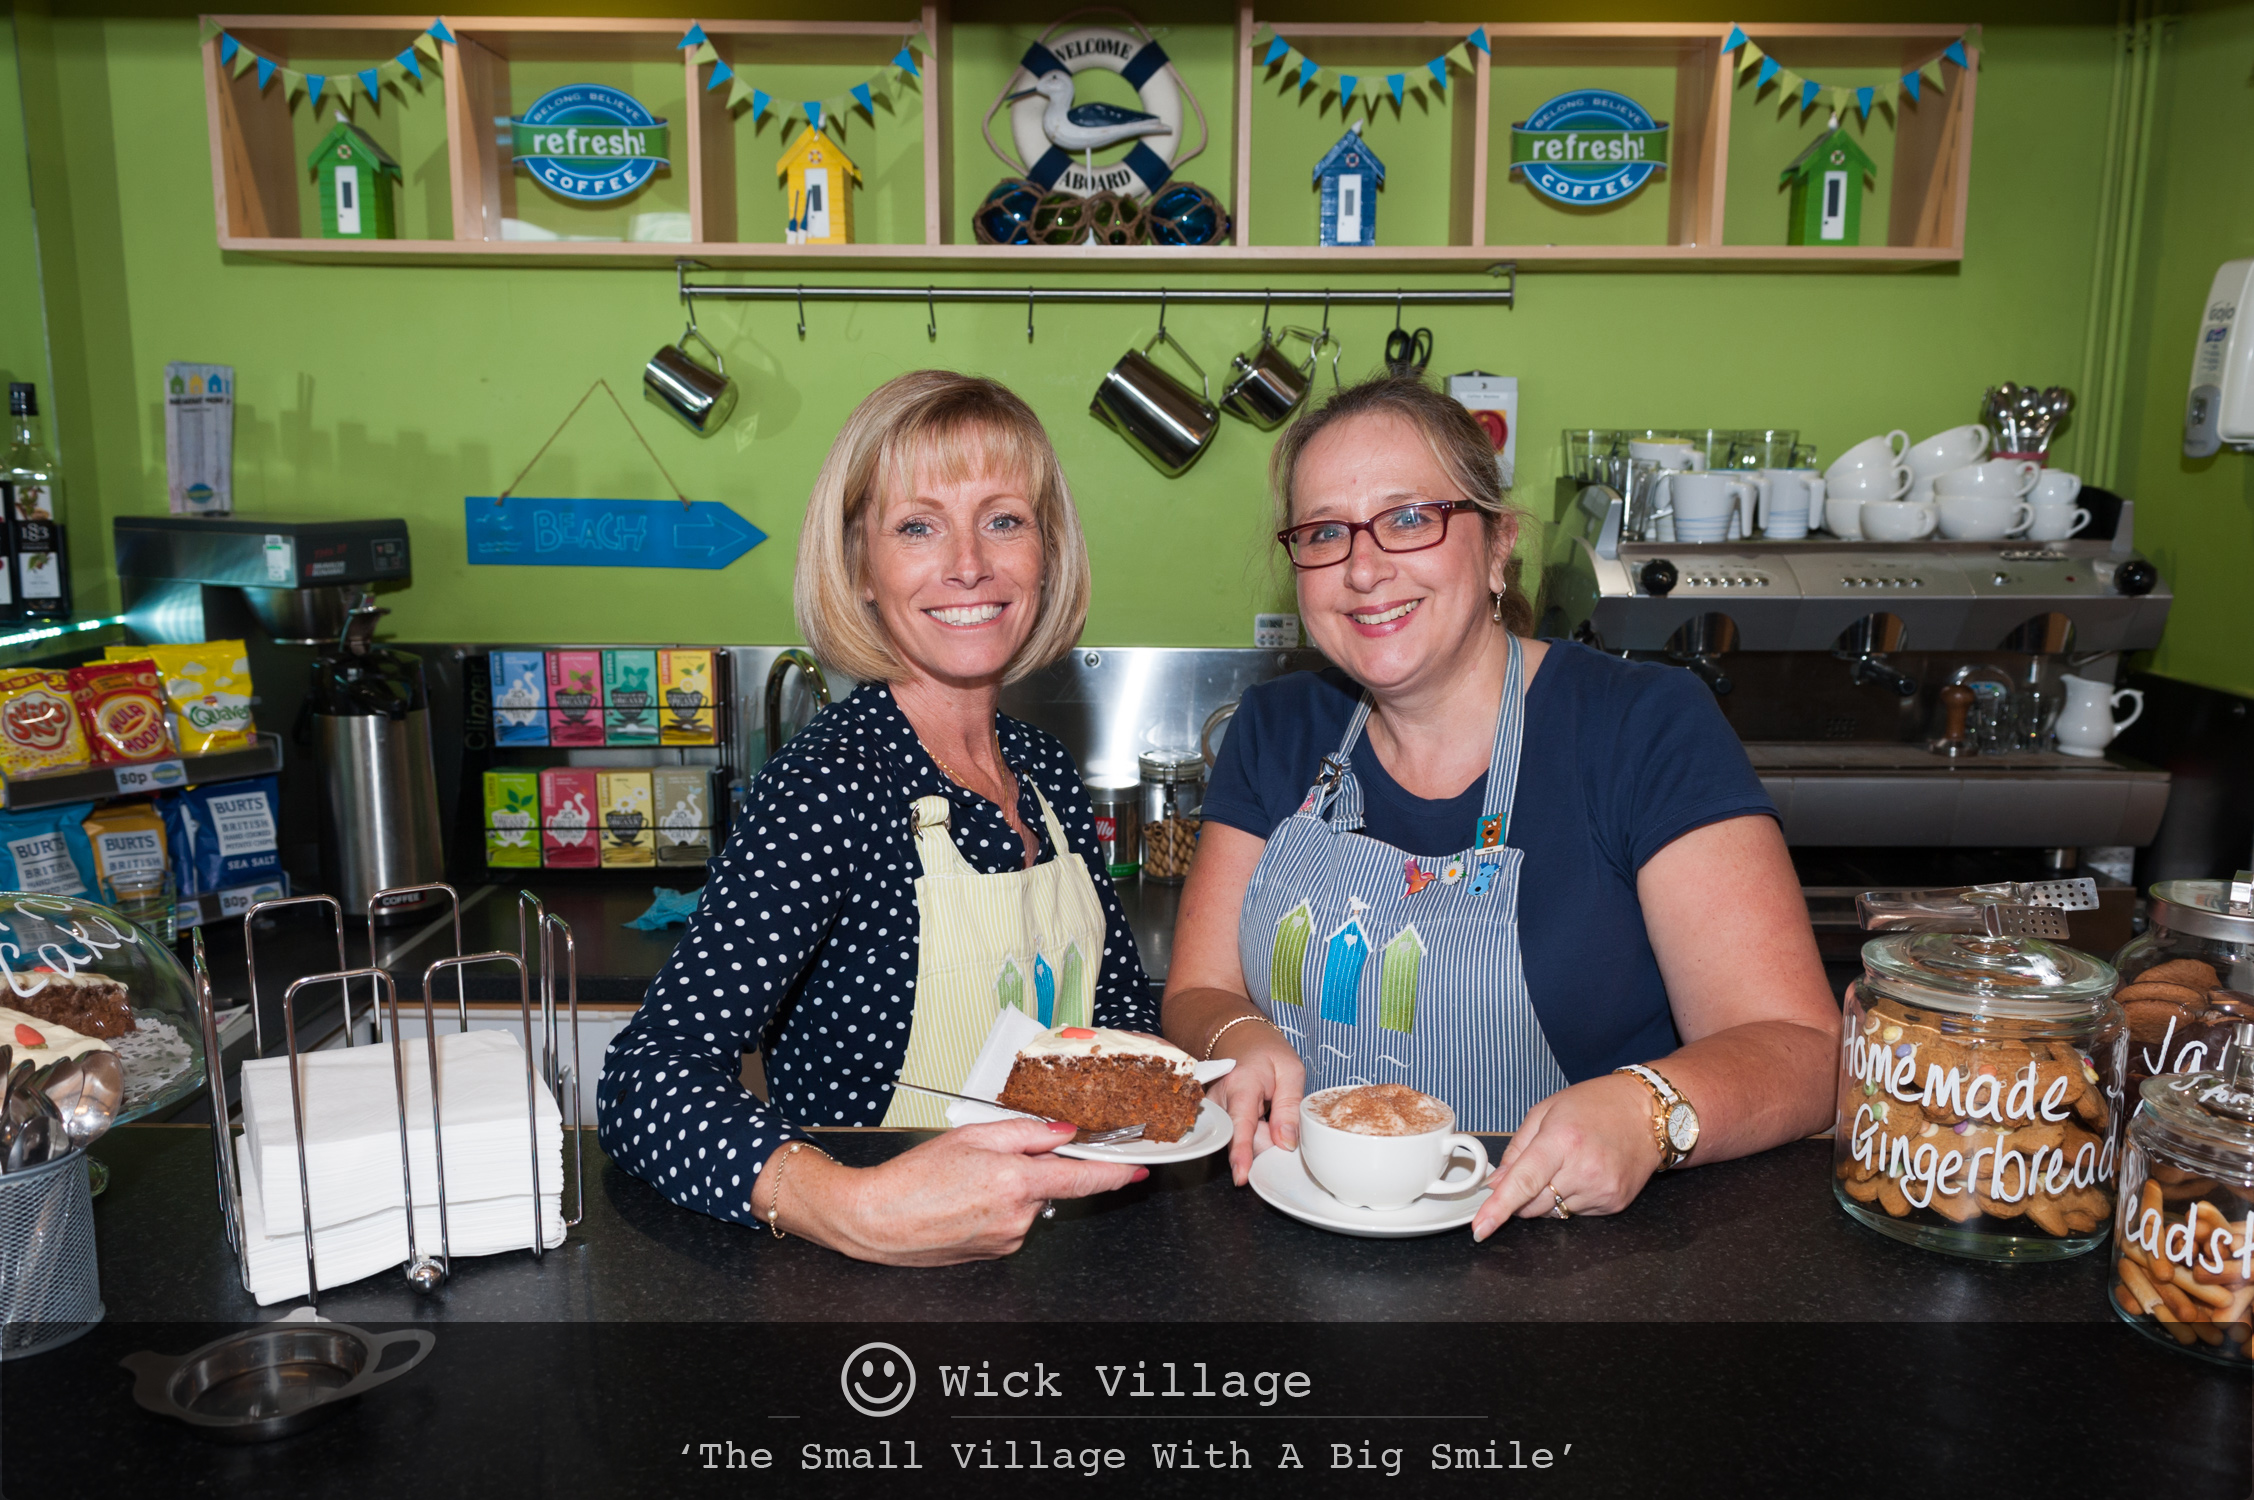 Refresh Coffee Shop at the Wickbourne Centre in Wick Village, Littlehampton.